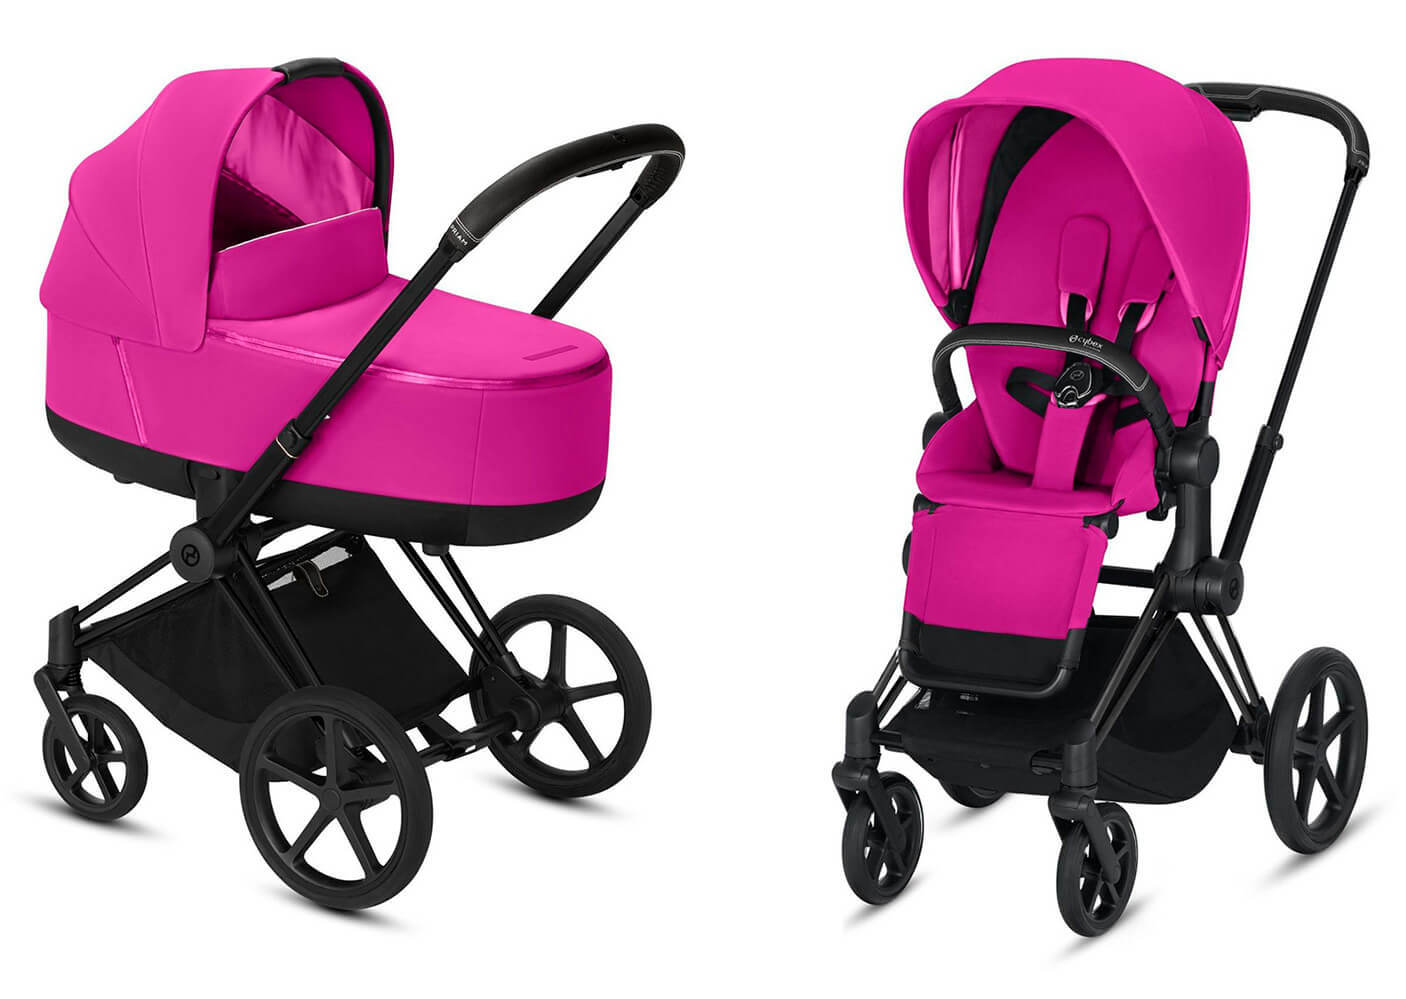 Цвета Cybex Priam 2 в 1 Детская коляска Cybex Priam III 2 в 1 Fancy Pink шасси Matt Black cybex-priam-iii-2-in-1-fancy-pink-matt-black.jpg